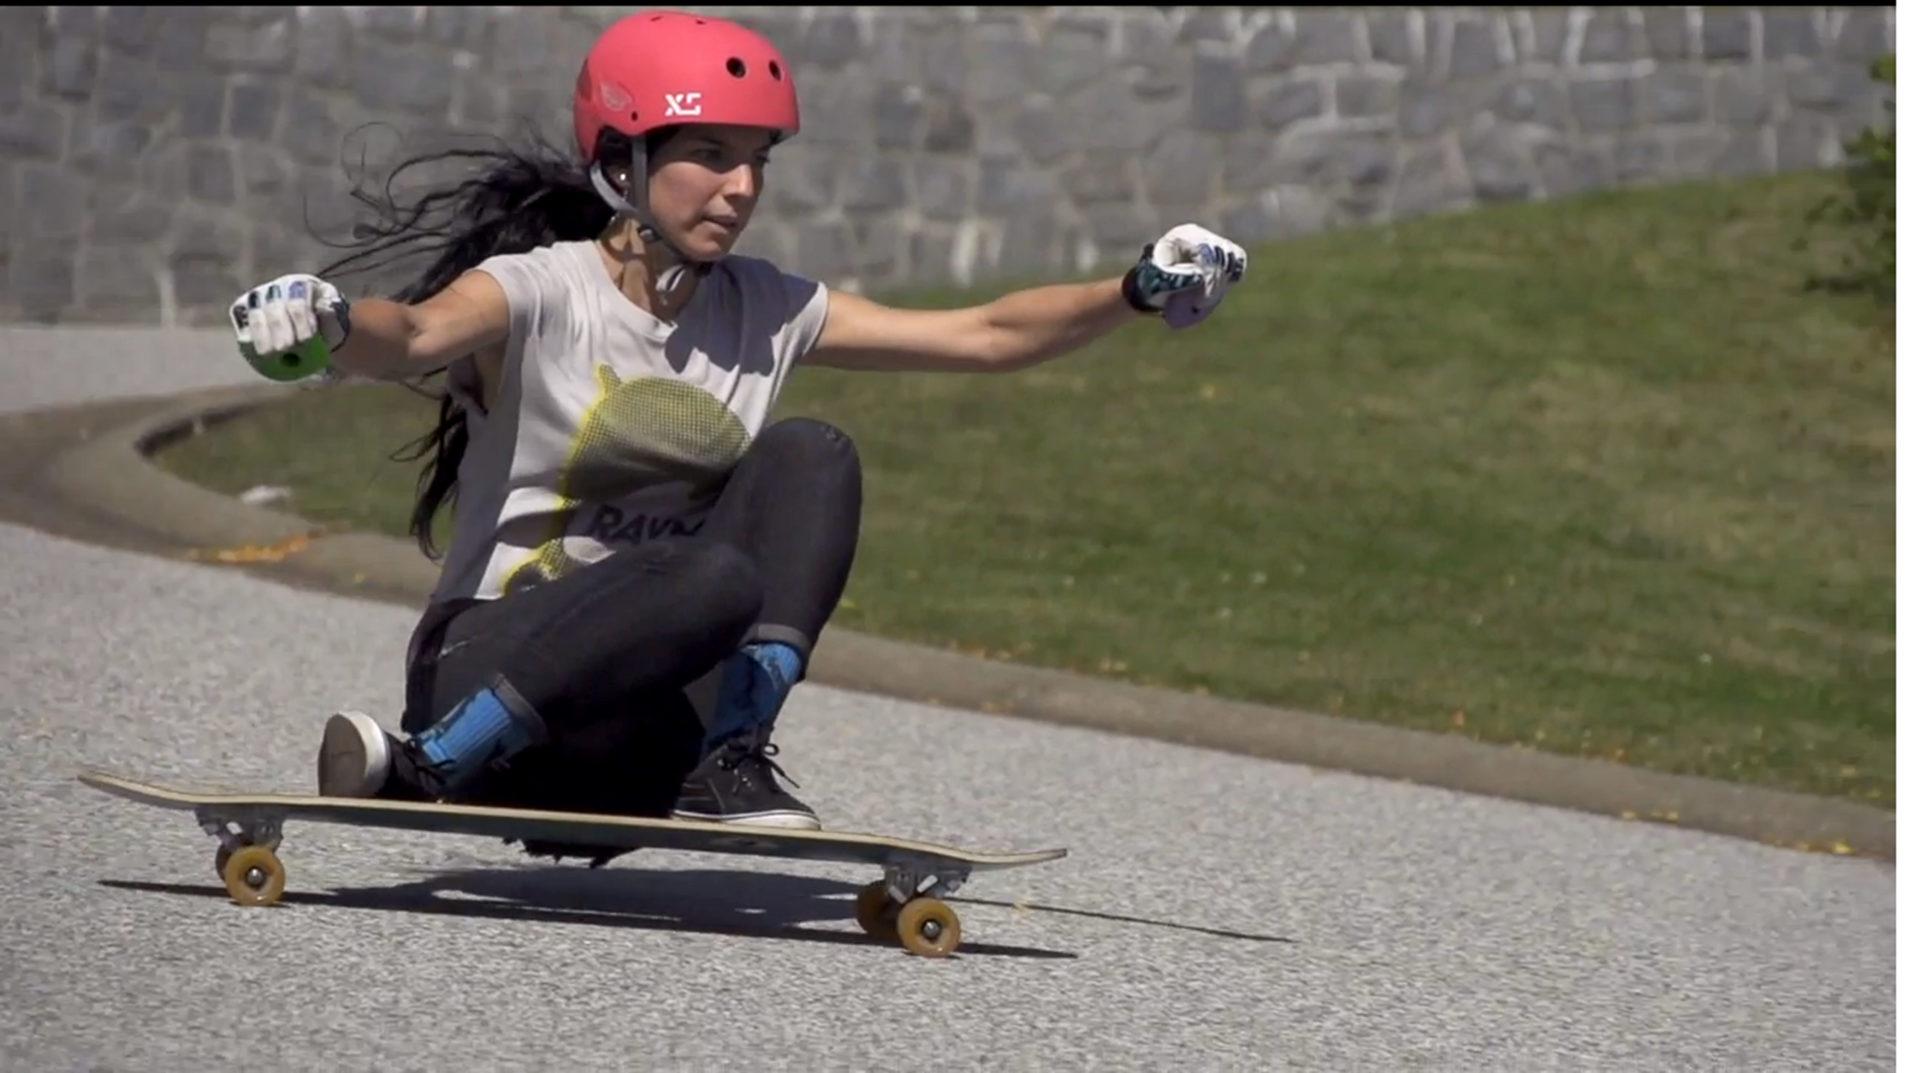 Longboard girls cre Marisa nunez Skate girl Vancouver